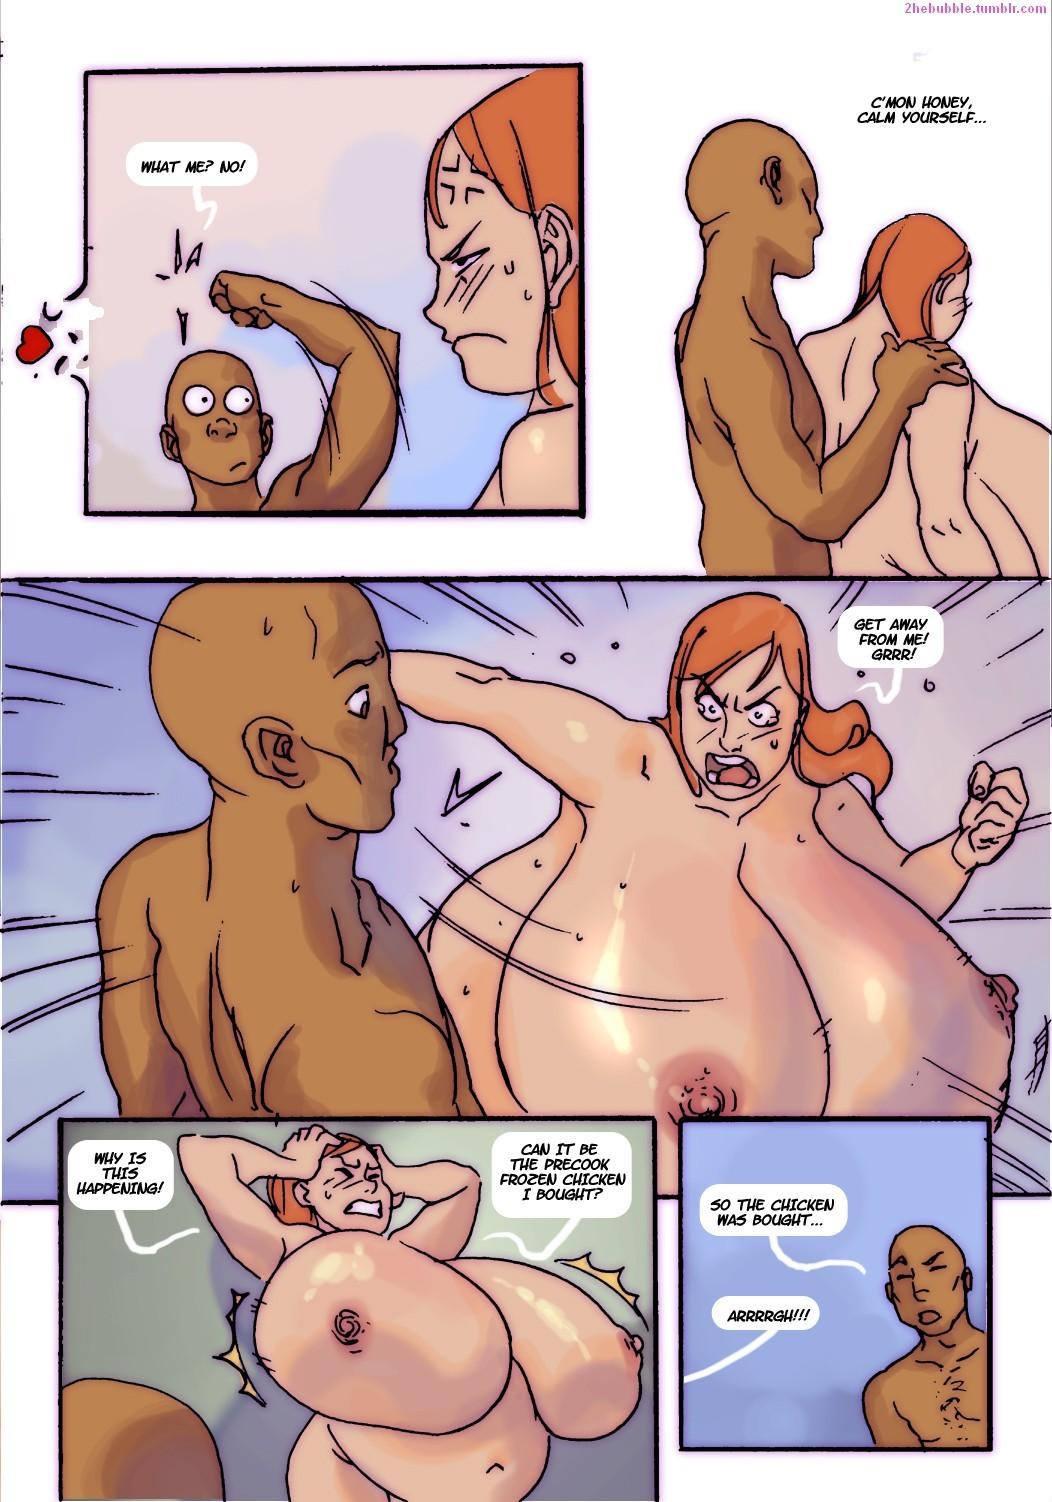 Porn Comics - Thought Bubble 10- Sidneymt porn comics 8 muses